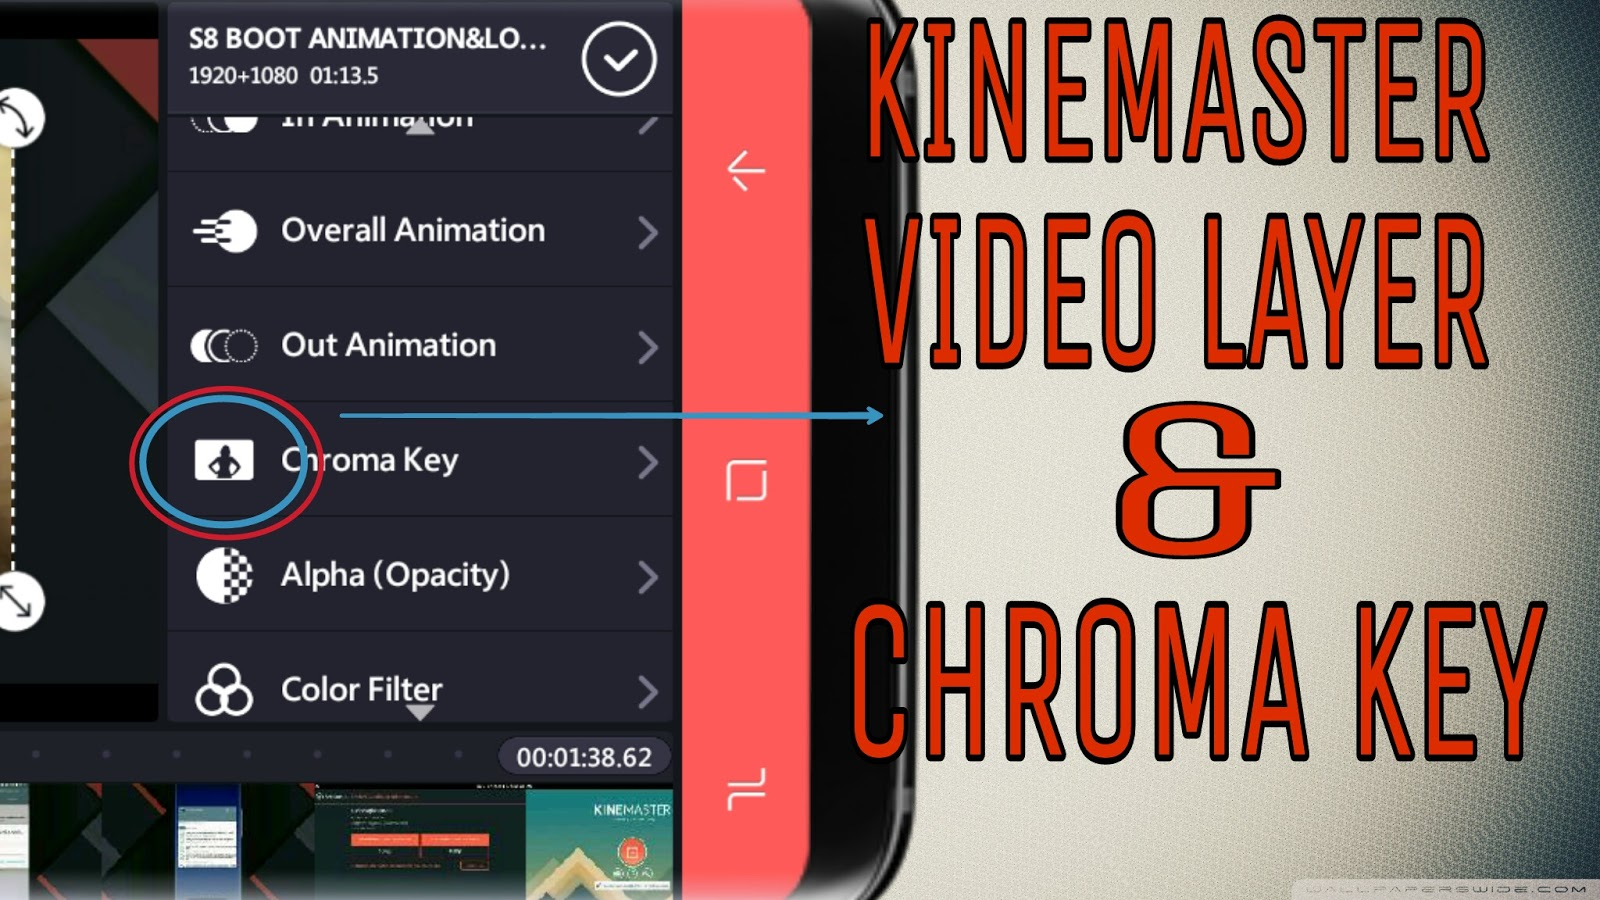 kinemaster with chroma key